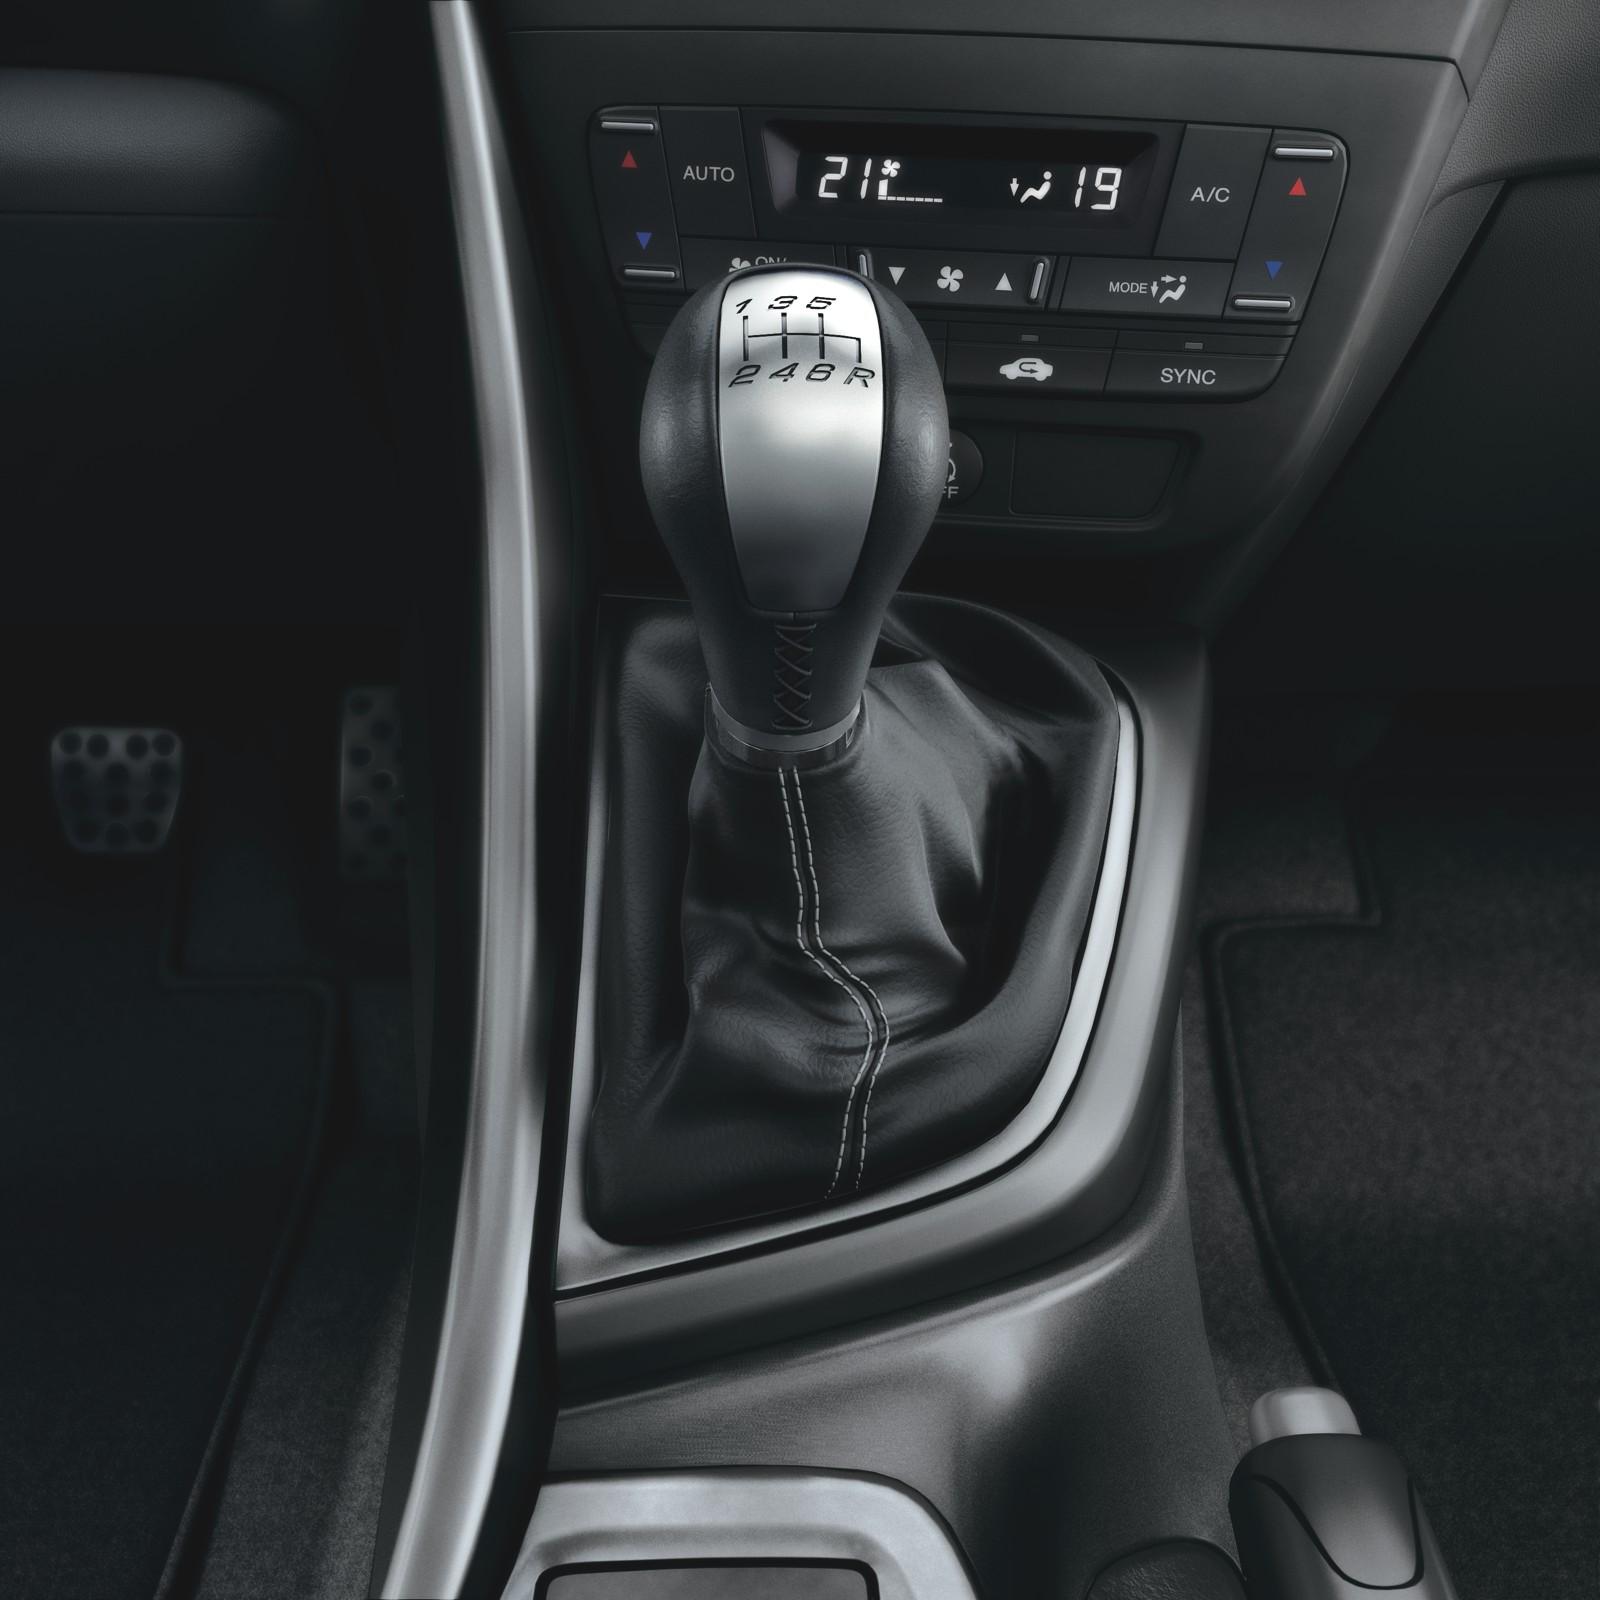 2013 Nissan Gt R Interior: Civic Interior(3)